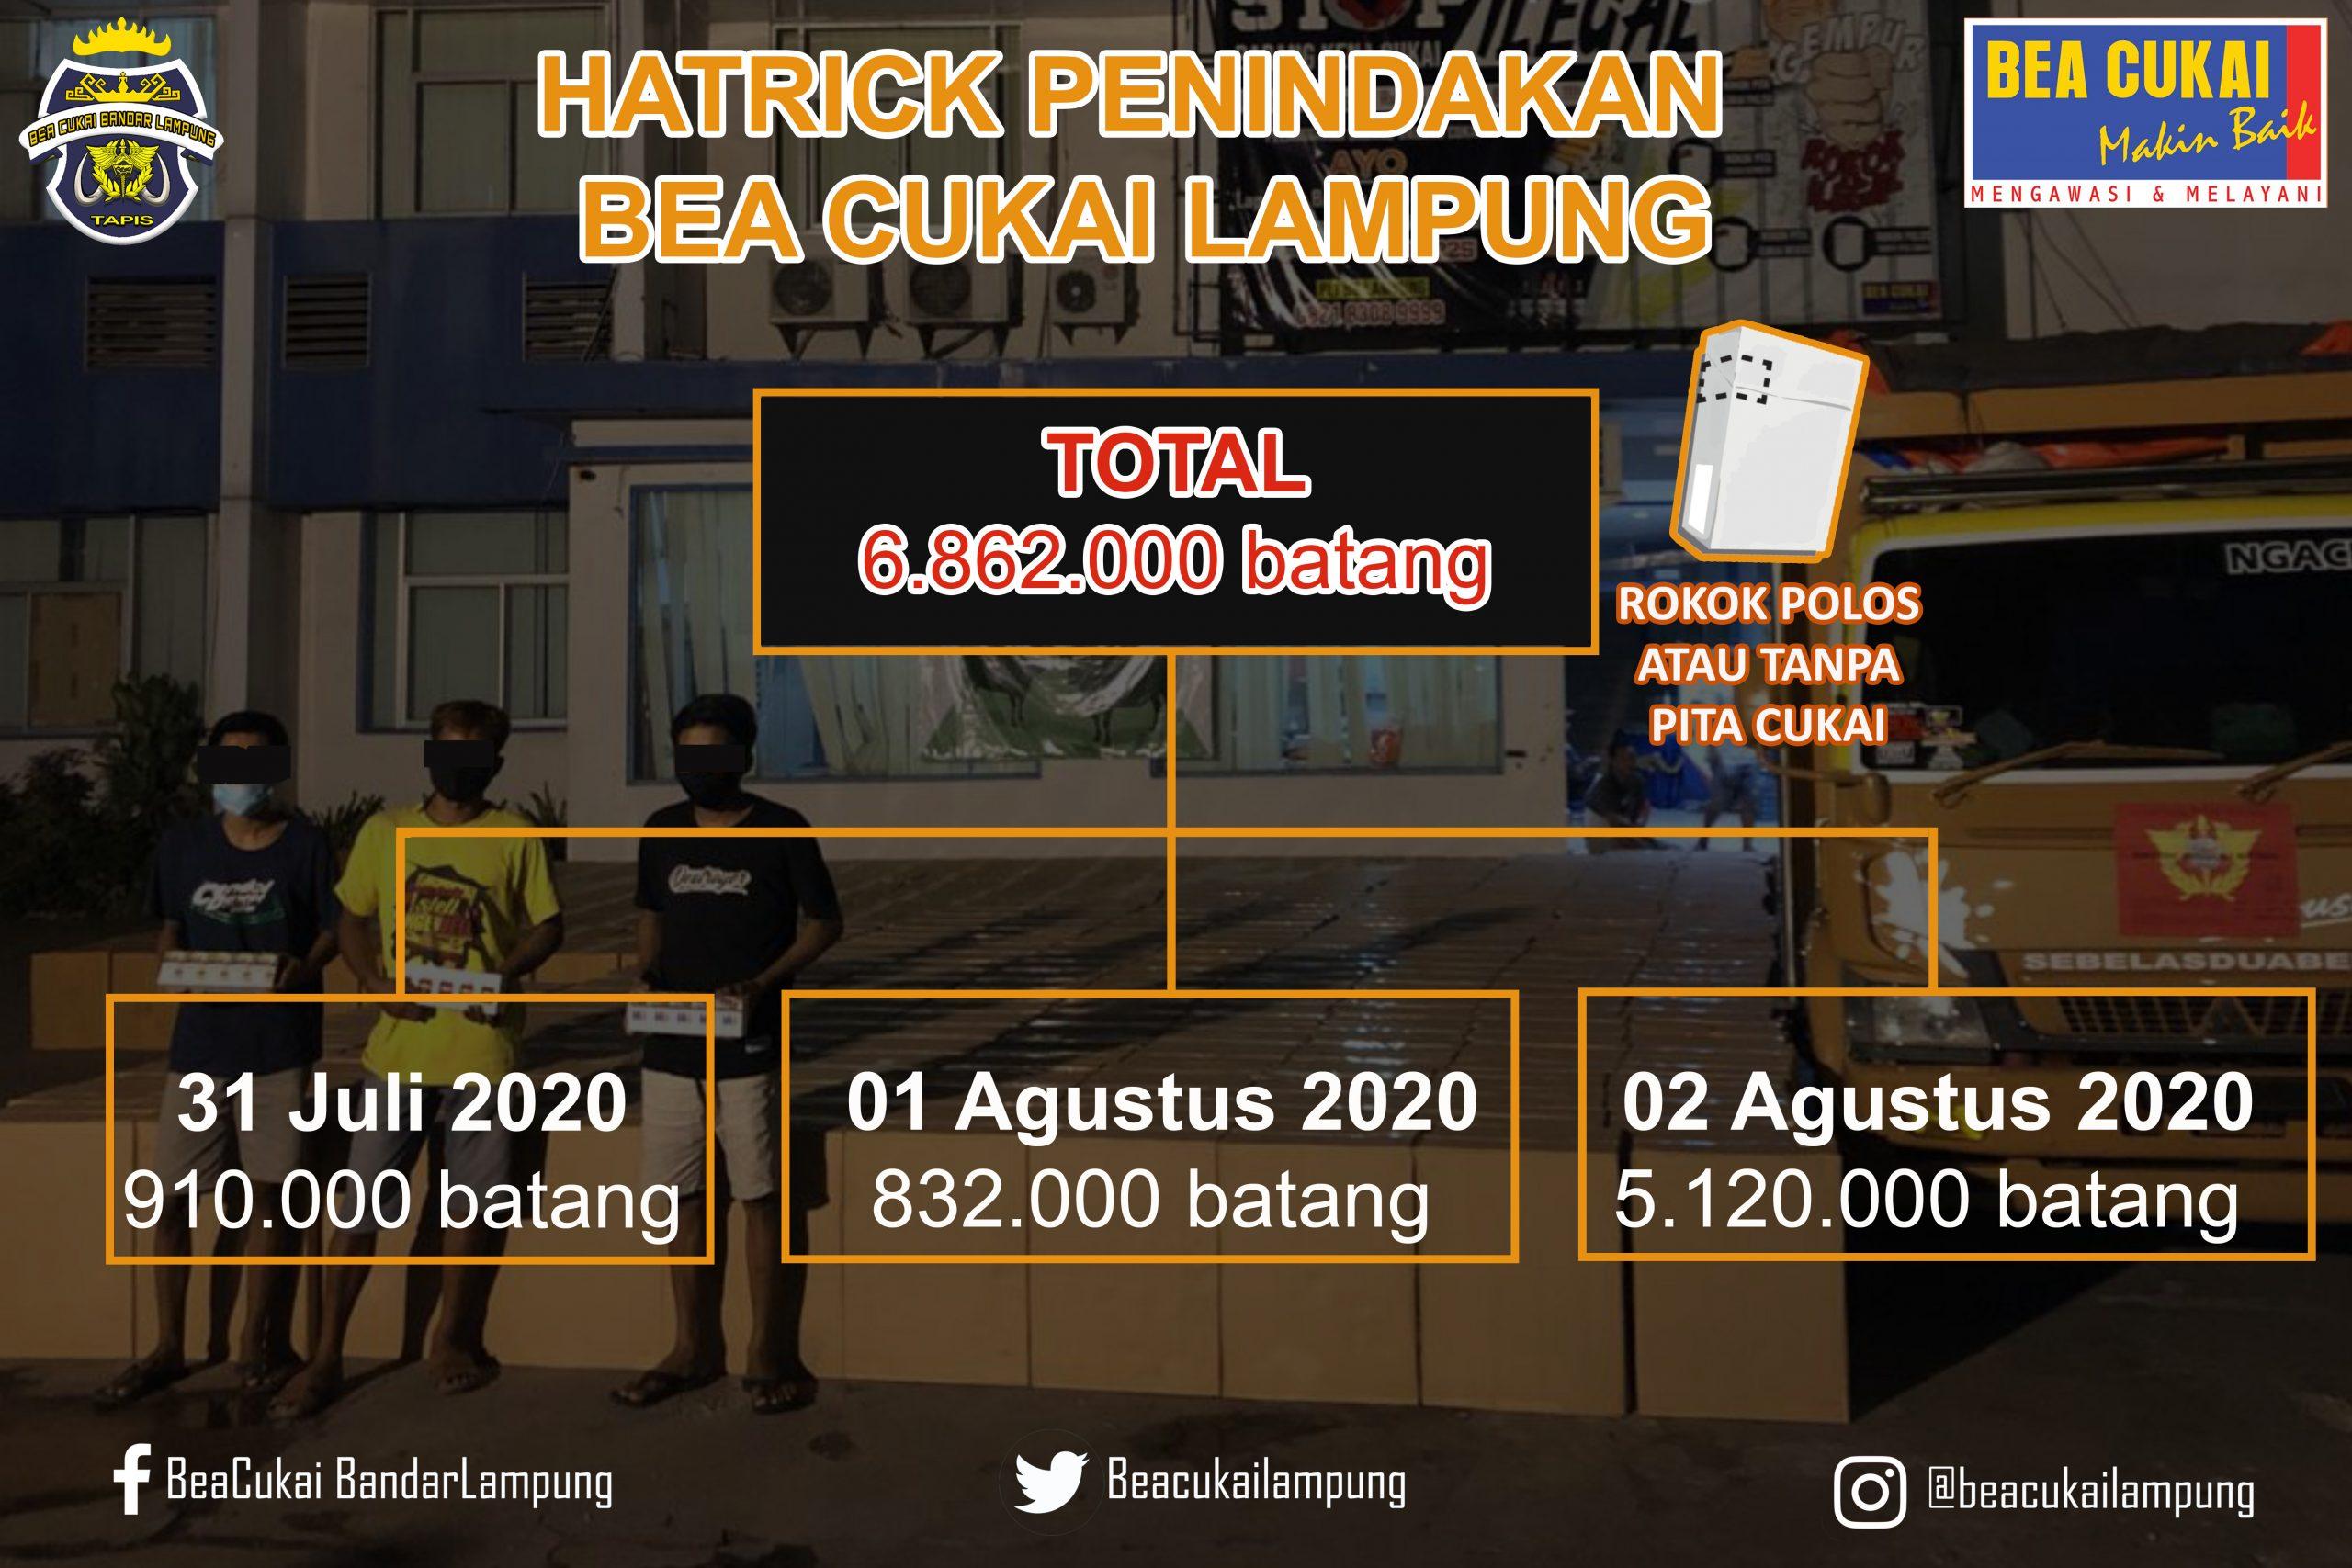 Bea Cukai Lampung, Hatrick Penindakan Dengan Total  6,8 Juta Batang Rokok Ilegal di Masa Liburan Idul Adha